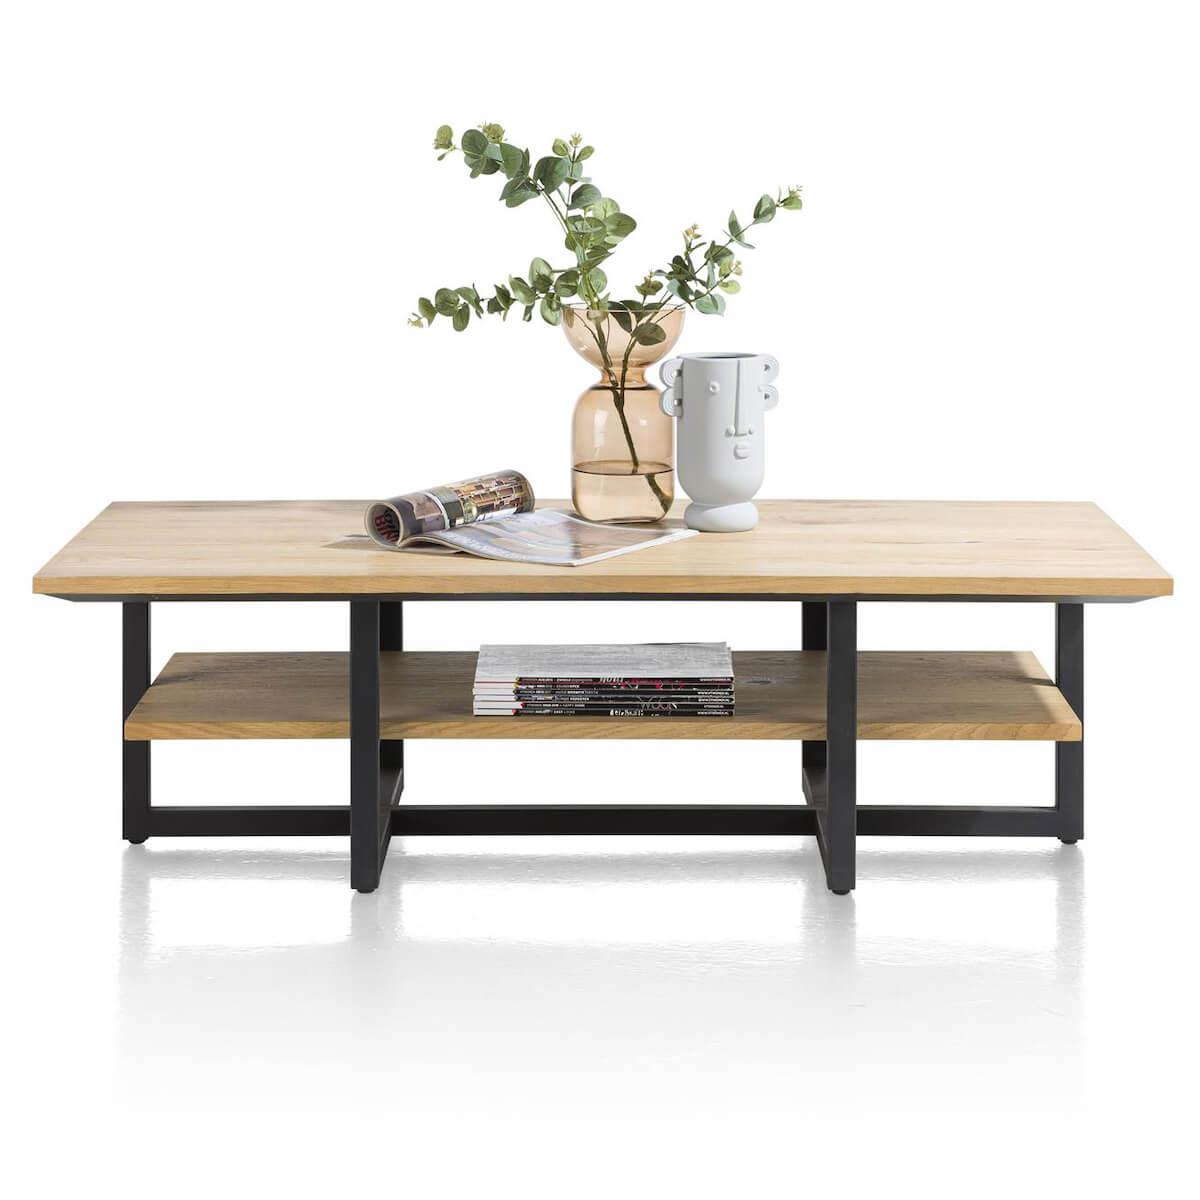 Table basse 60x120cm BELO Xooon